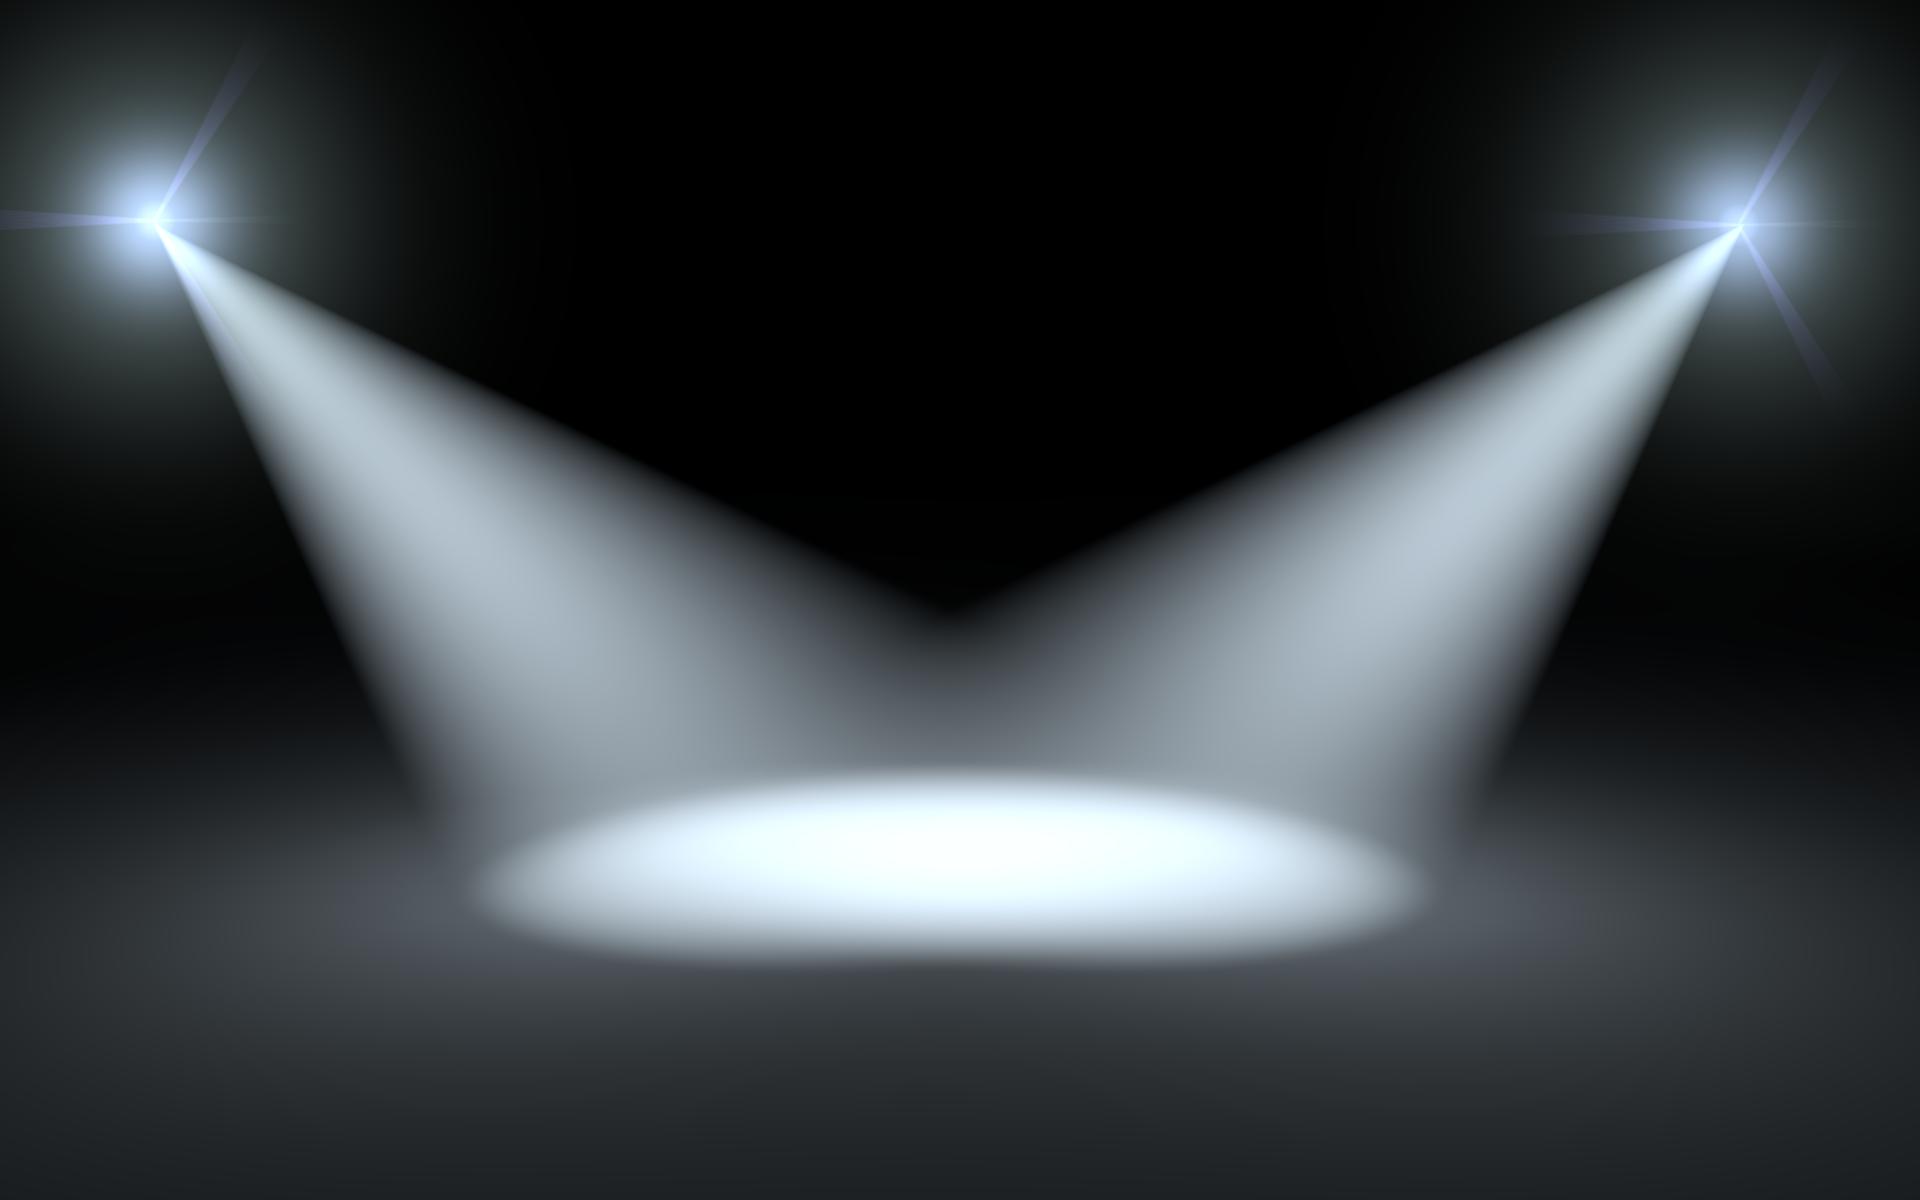 PlusPng pluspng.com Spotlight Clip Art Free | Clipart Panda - Free Clipart Images  PlusPng . - Spotlight PNG HD Free